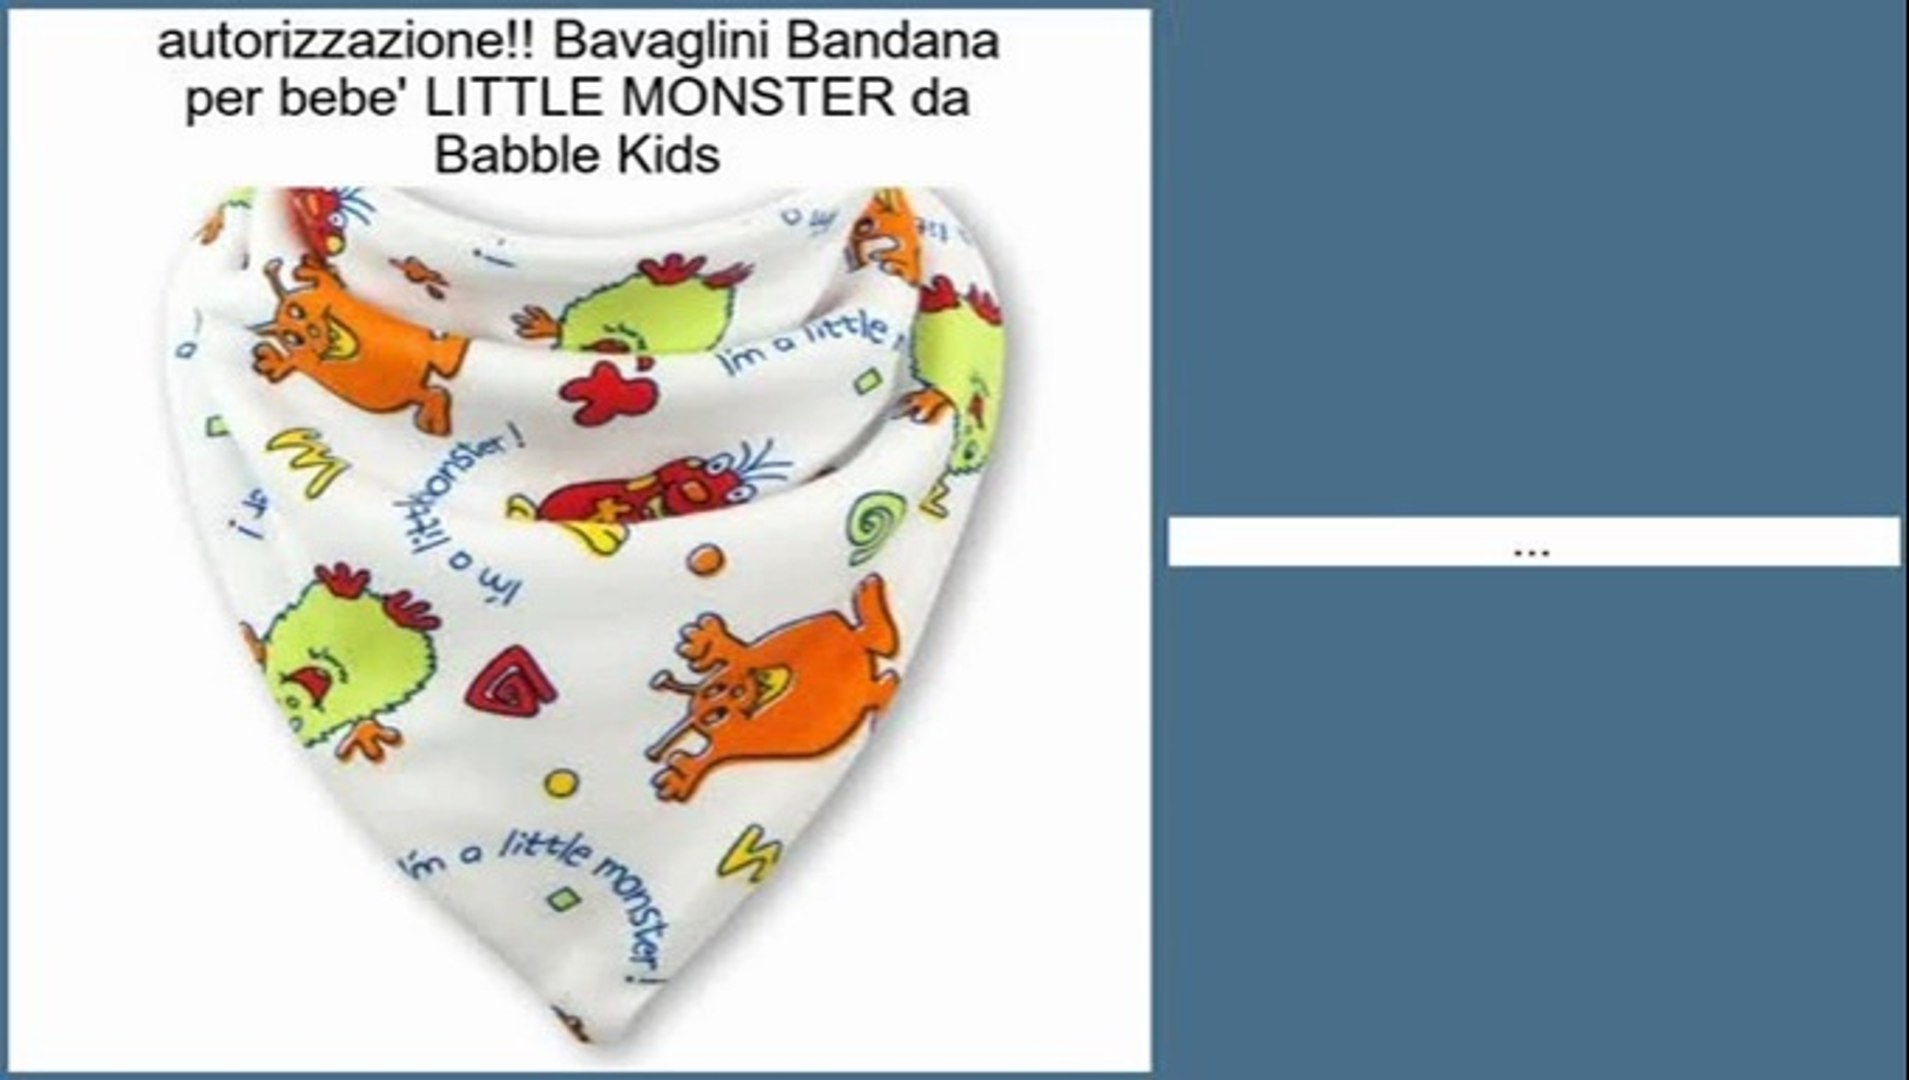 Bavaglini Bandana per bebe' LITTLE MONSTER da Babble Kids Recensioni